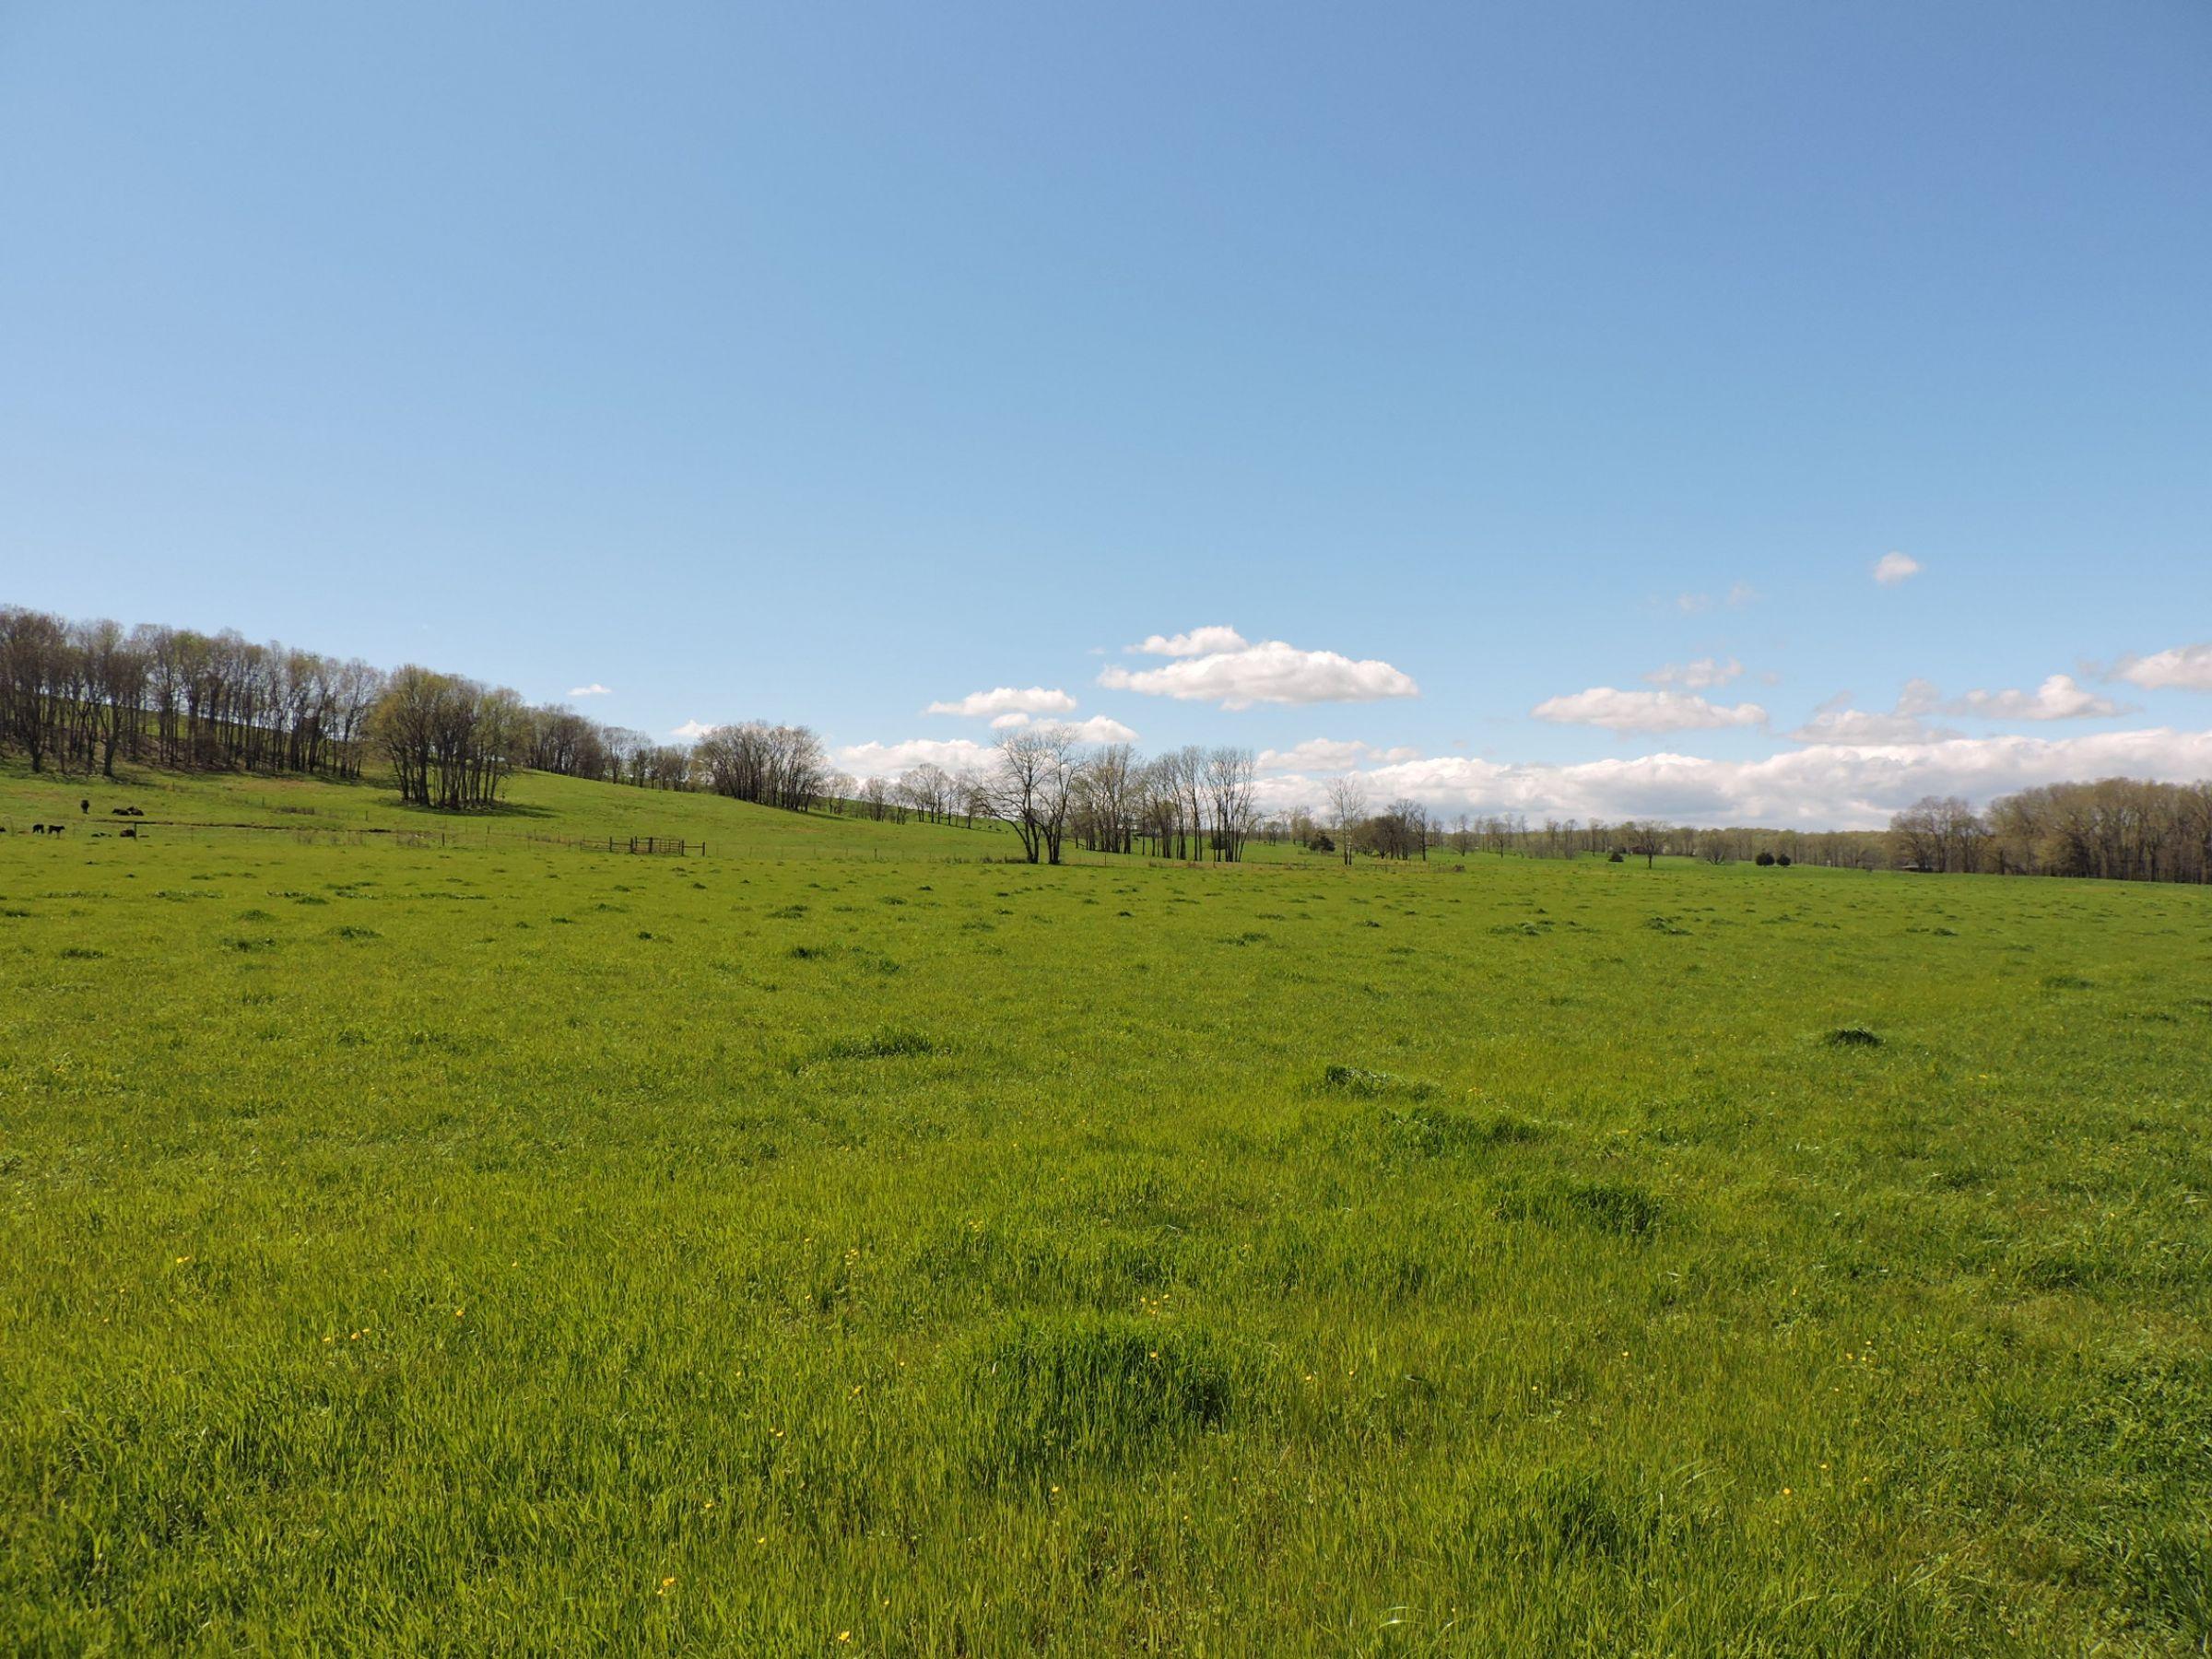 land-sharp-county-arkansas-695-acres-listing-number-15405-14-2021-04-13-213615.JPG